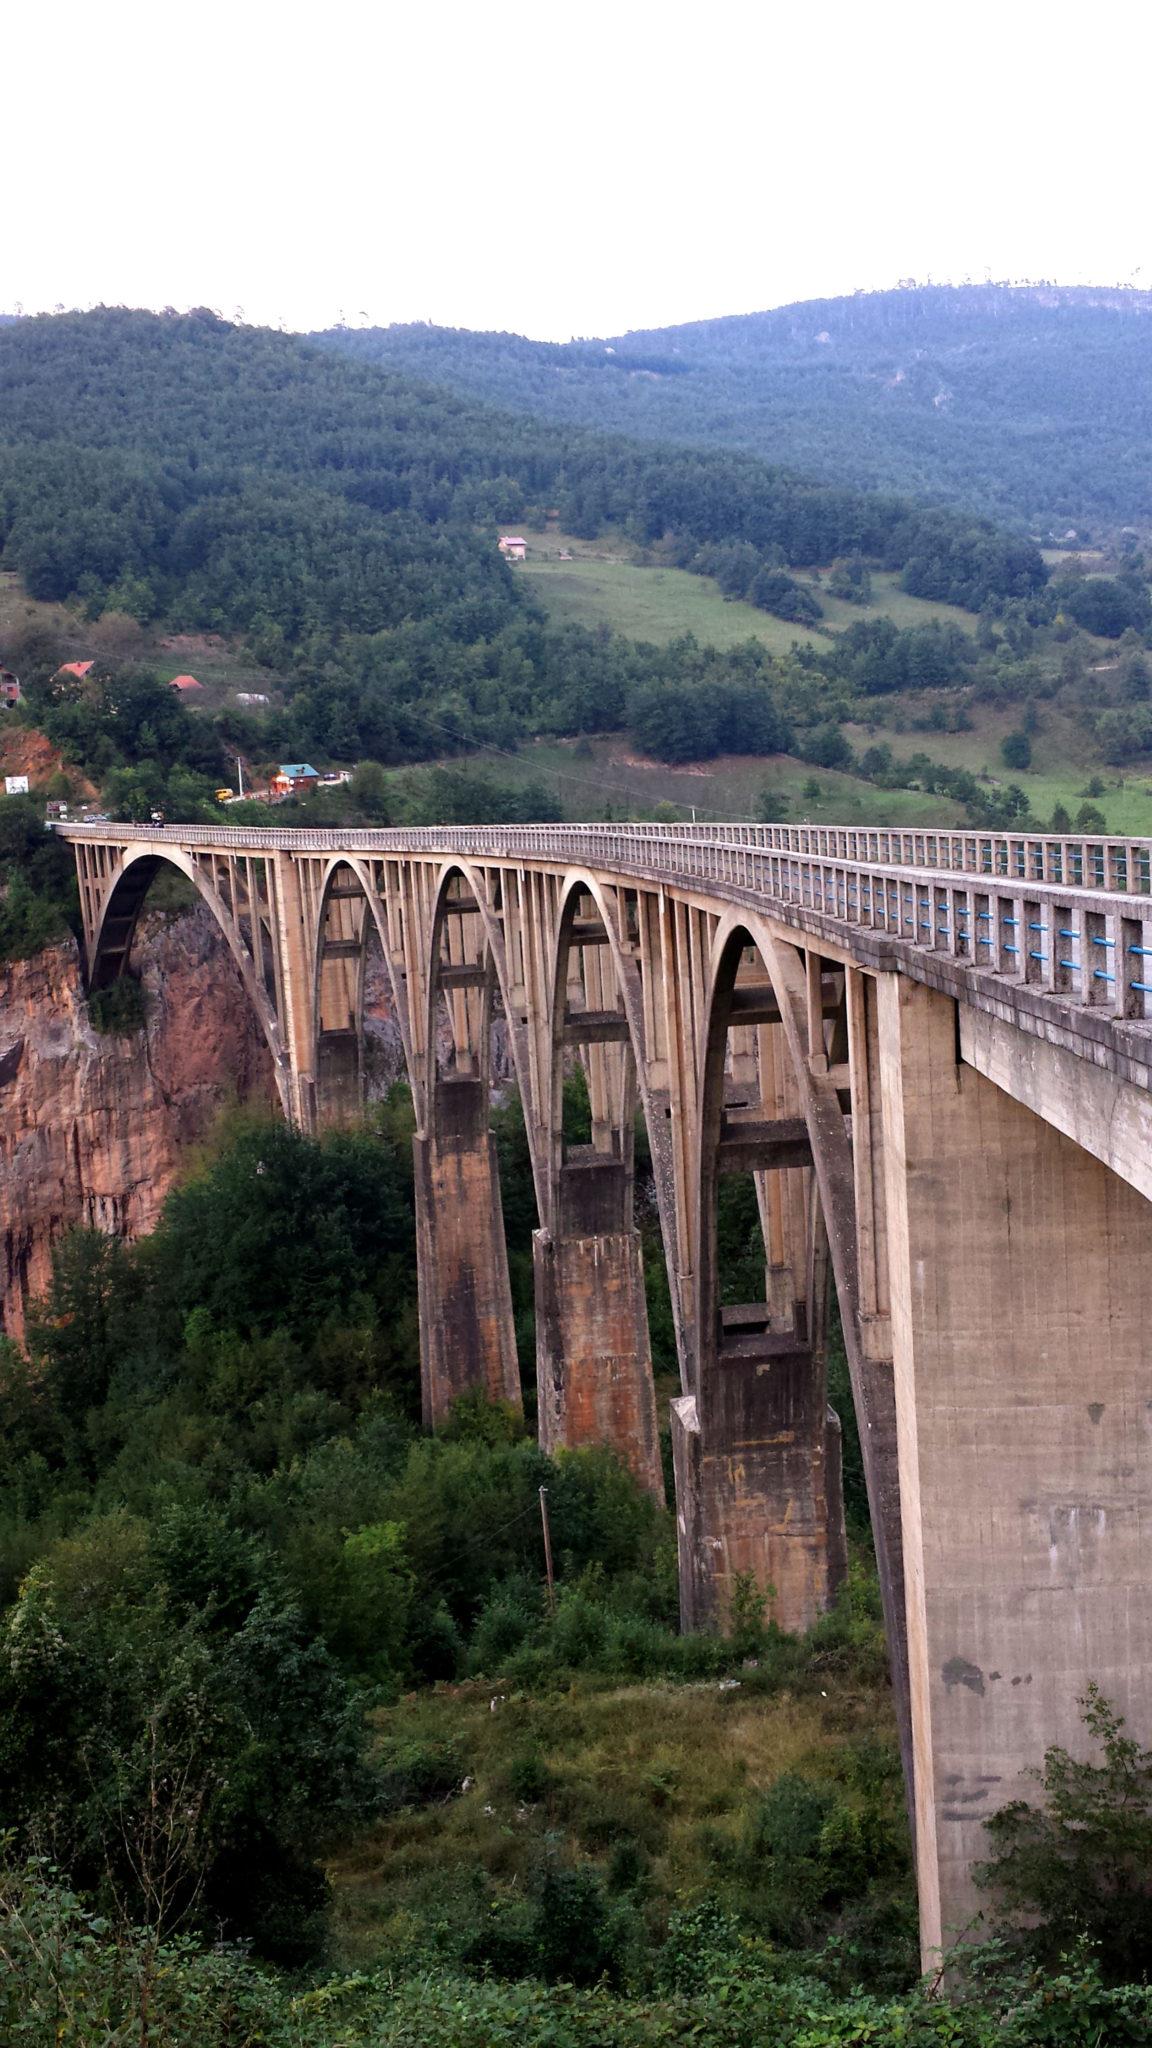 Hemaposesesvalises_montenegro_tyrolienne_zipline_tara_voyage_travel_blog2